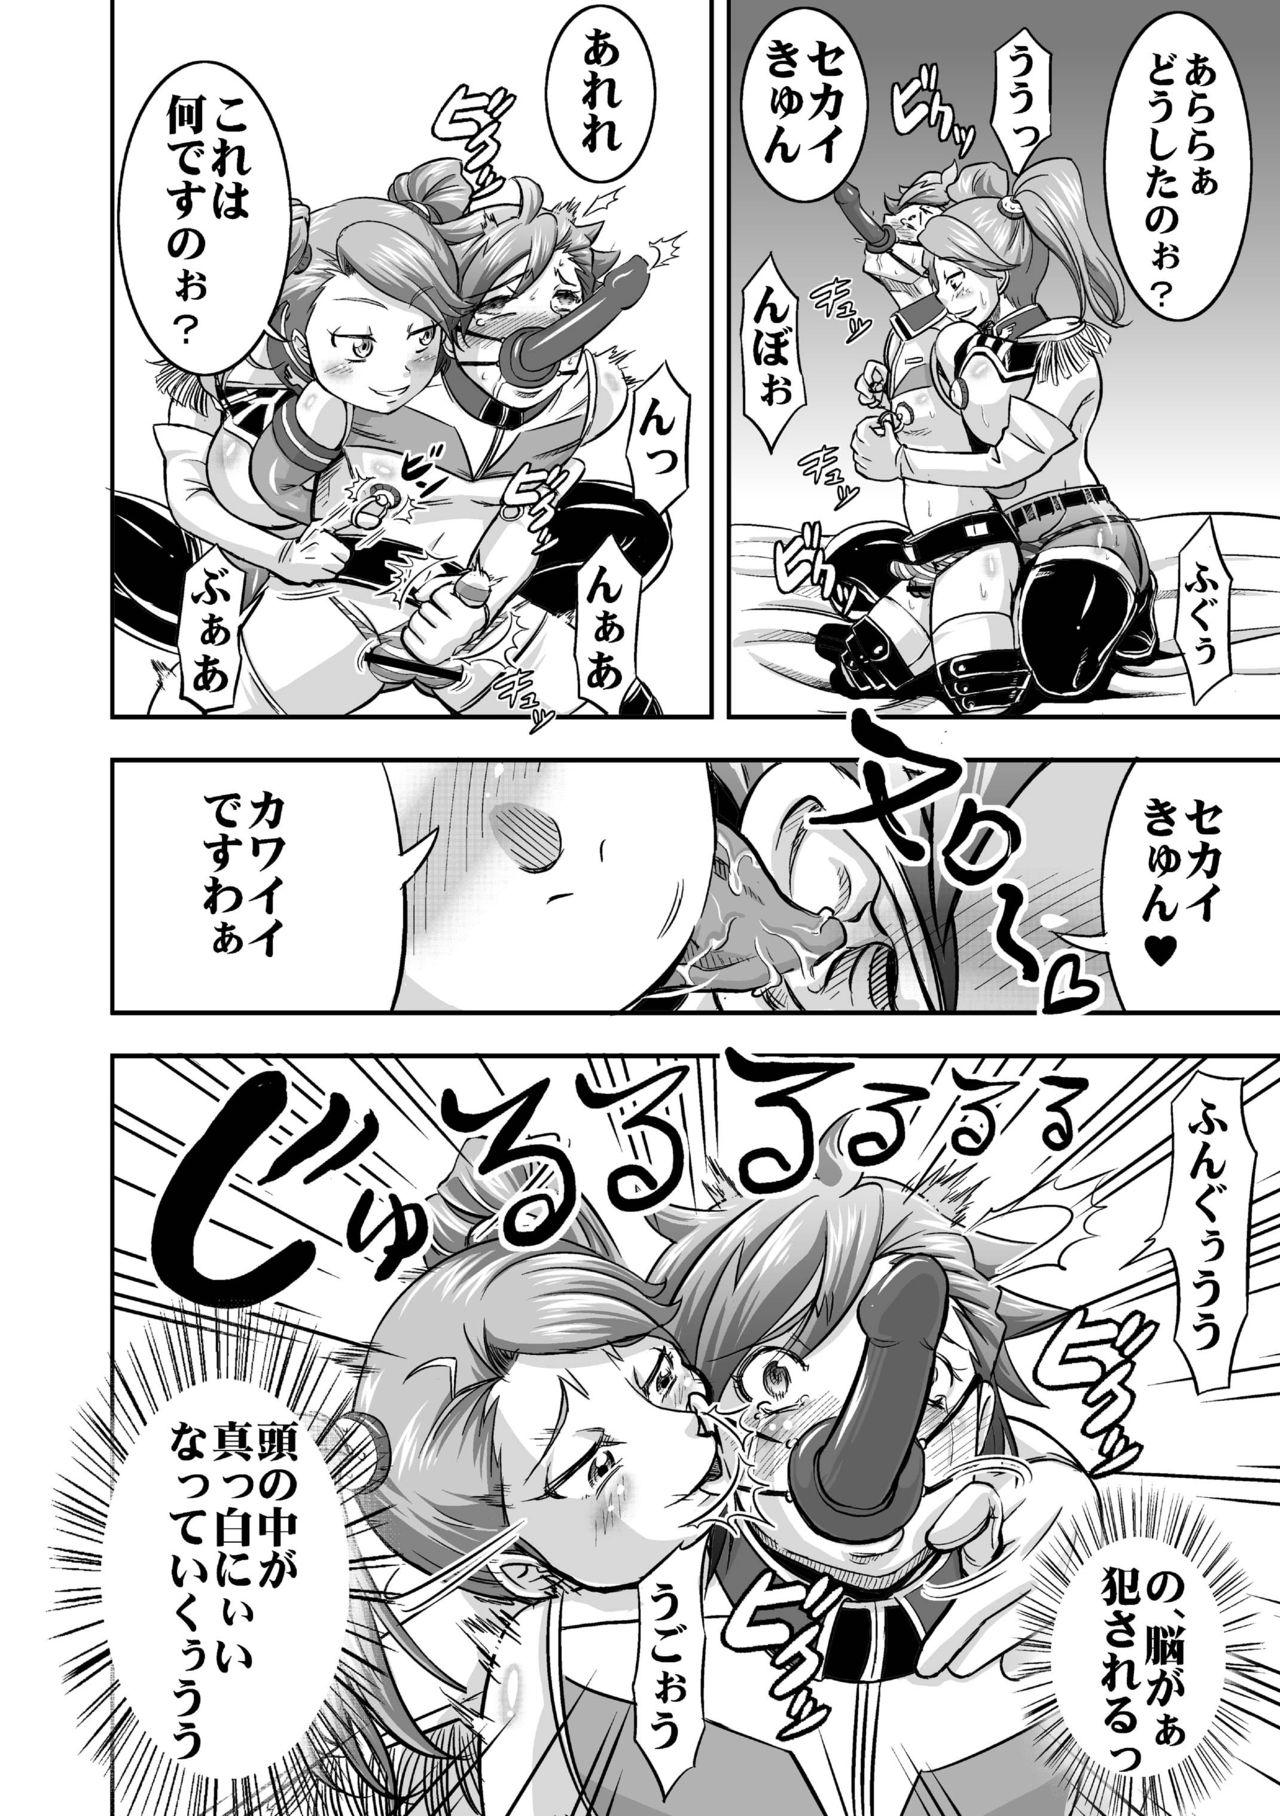 [Nisepakudo (Nisepakuman-san)] Plamo-kyou Chijo 3 -Futomashi- (Gundam Build Fighters Try) [Digital] 7